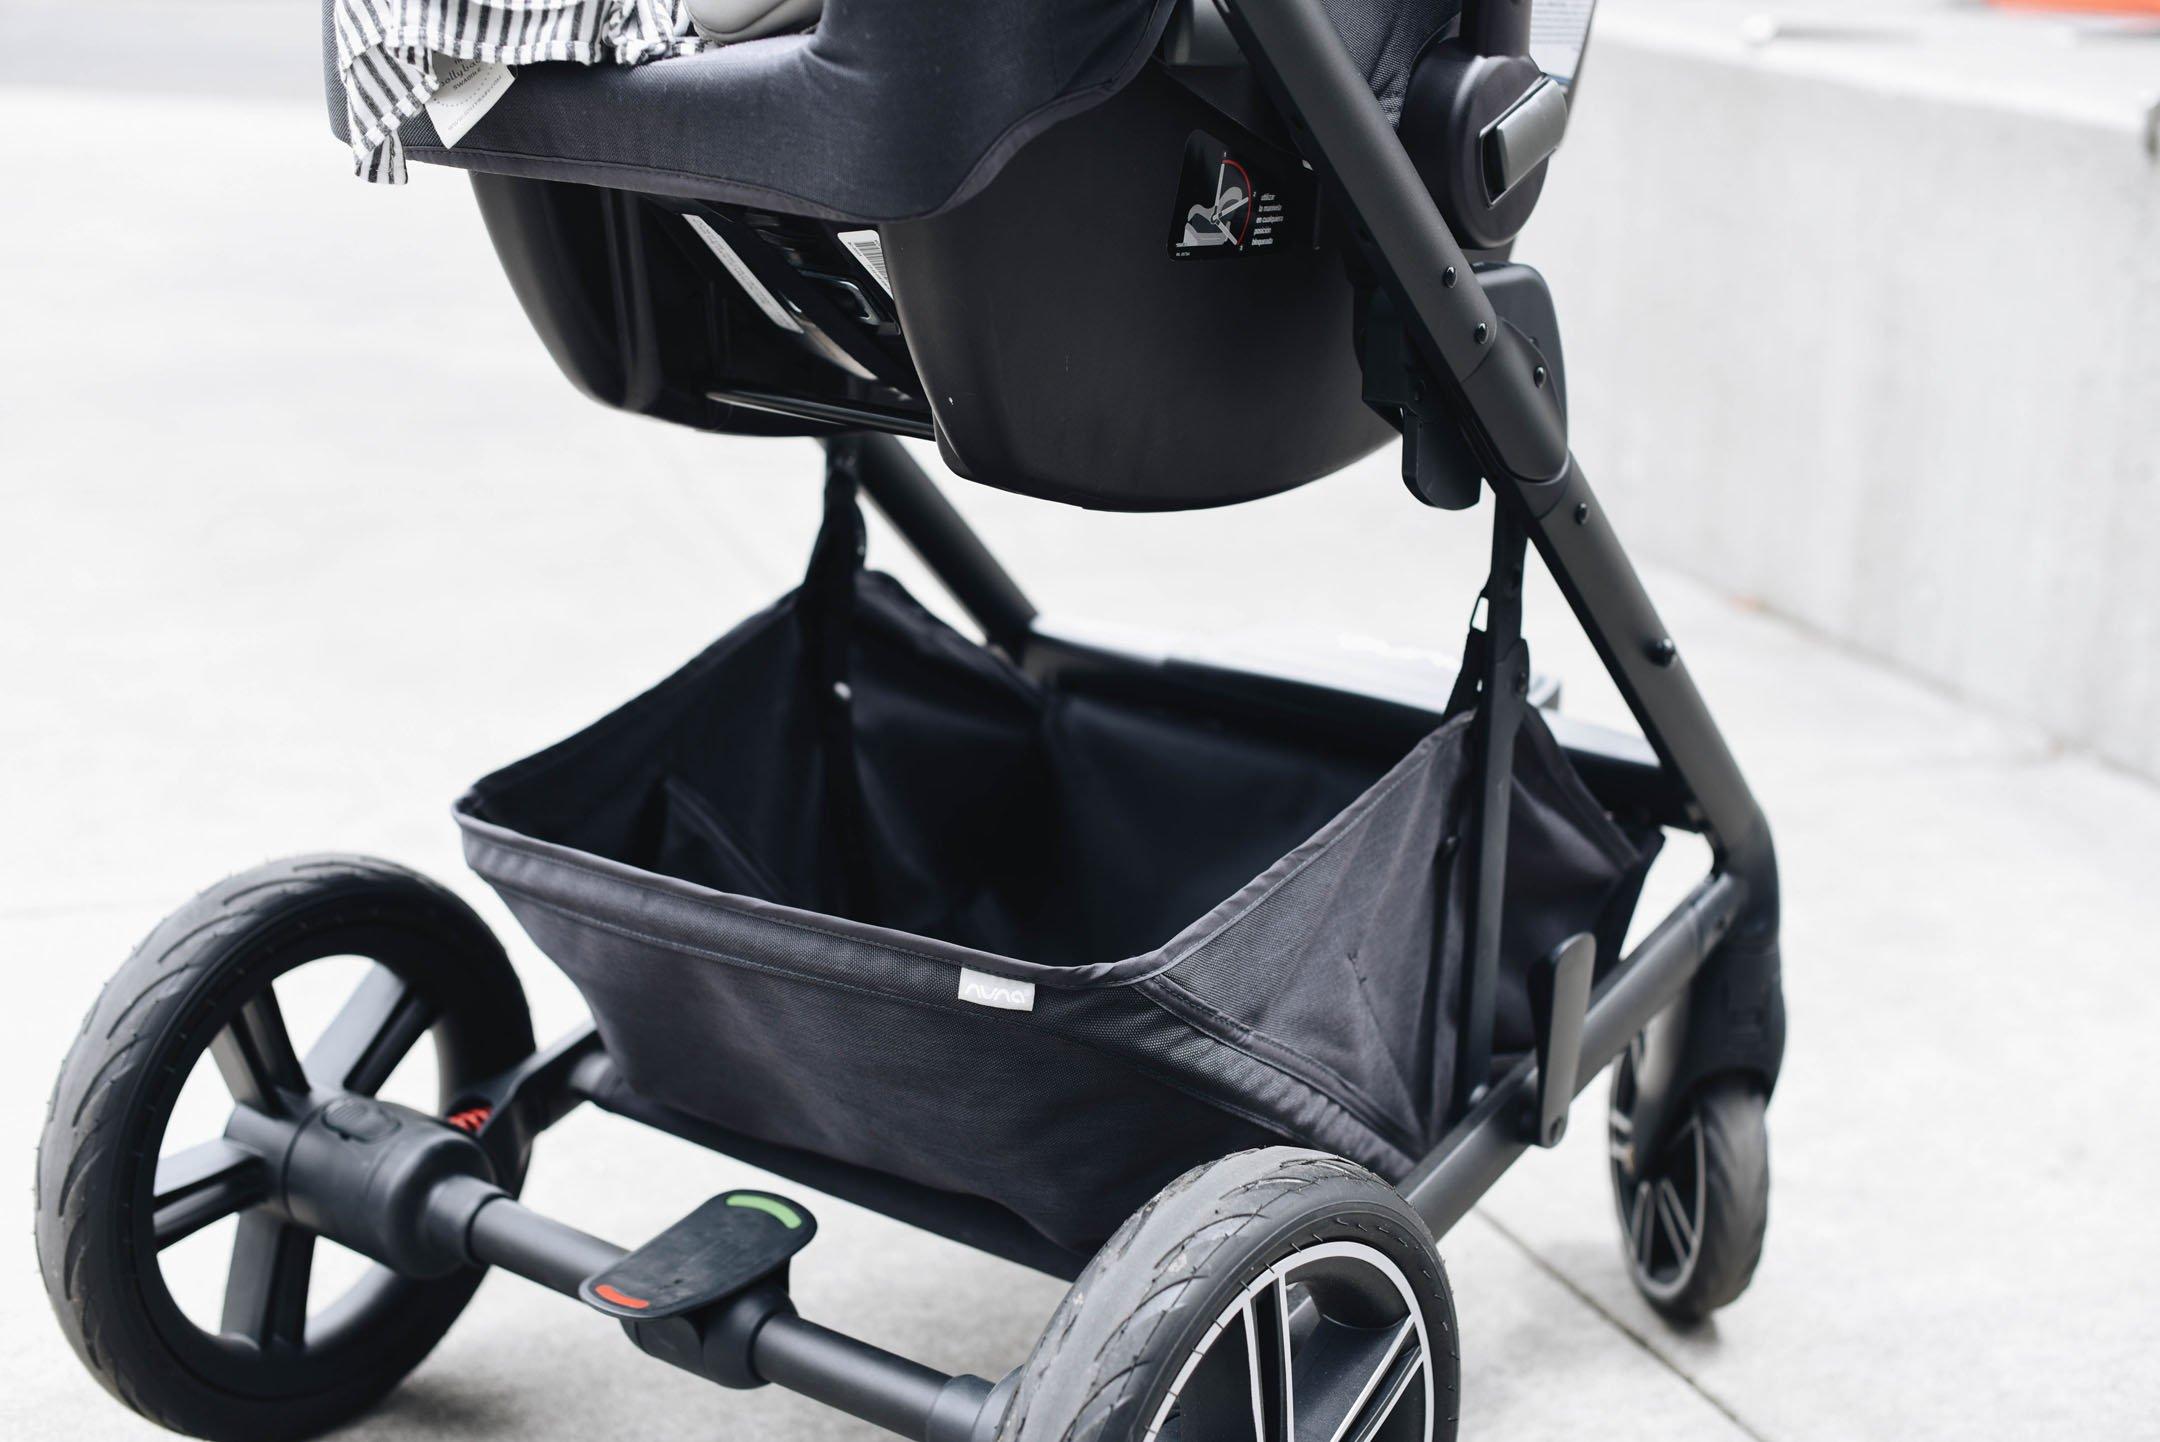 Nuna Mixx Stroller System Review